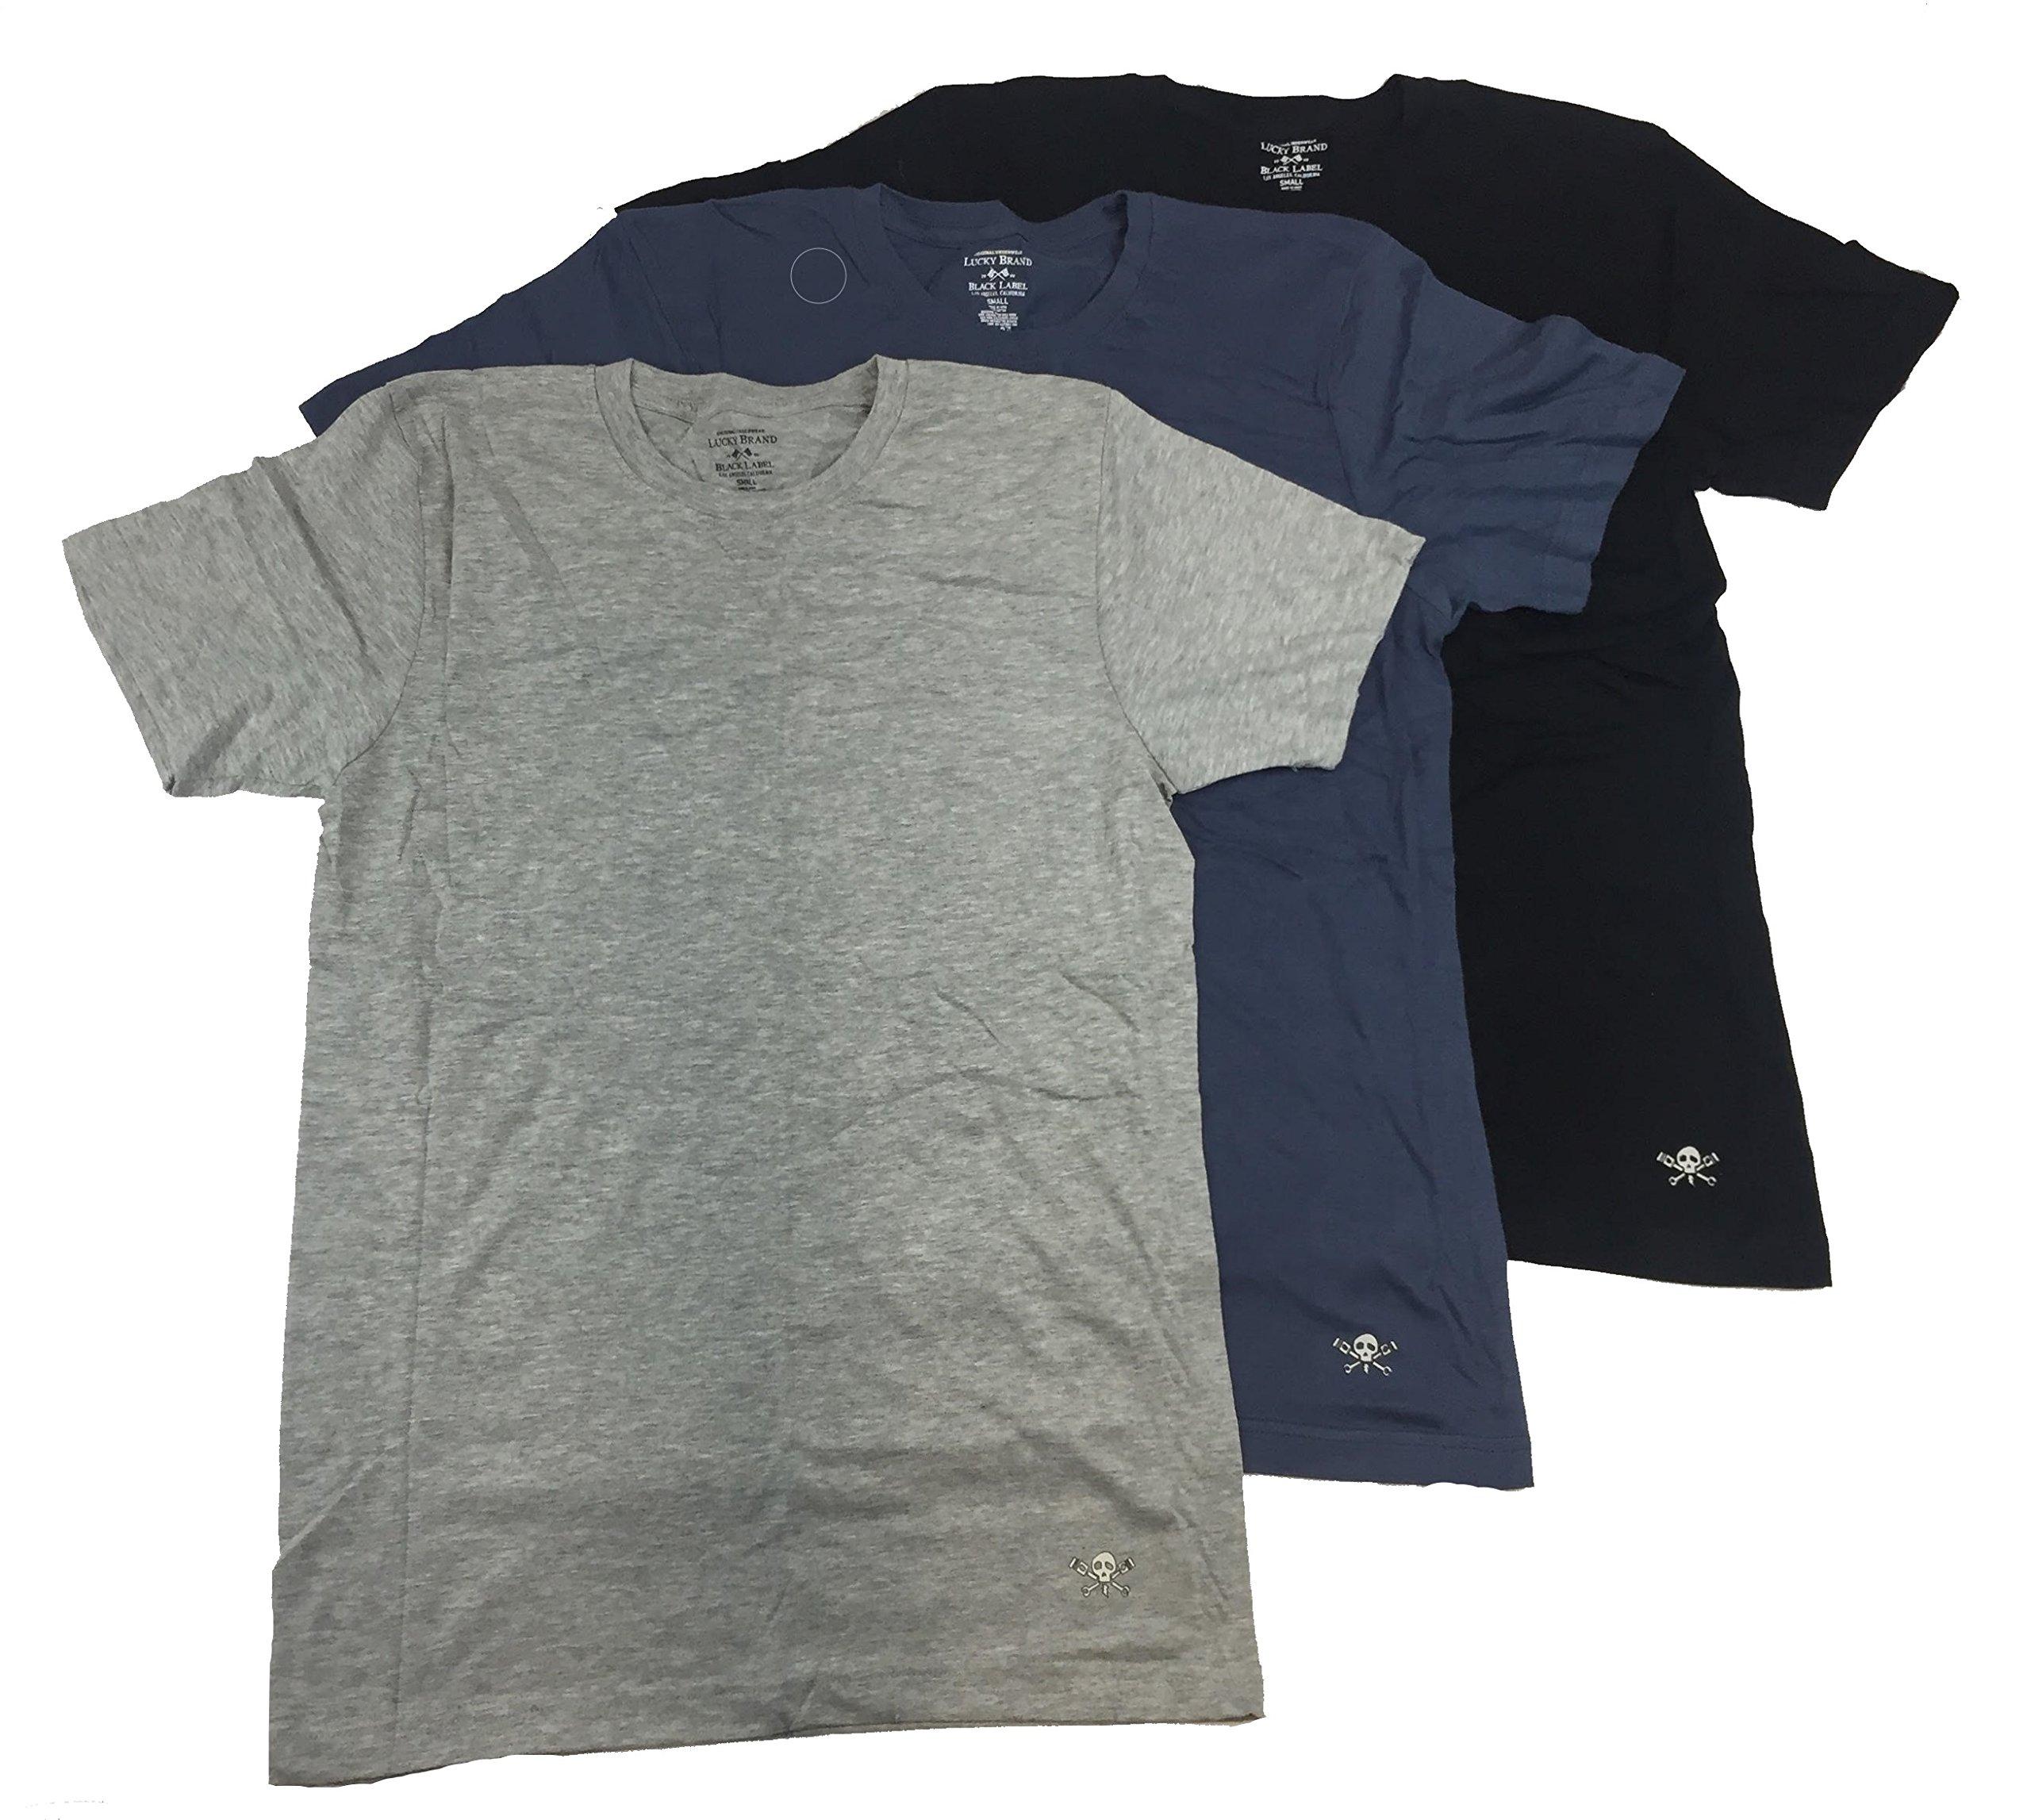 Lucky Brand Men's Three-Pack Crew T-Shirt (Black Label/Blue/Heather Grey, S)